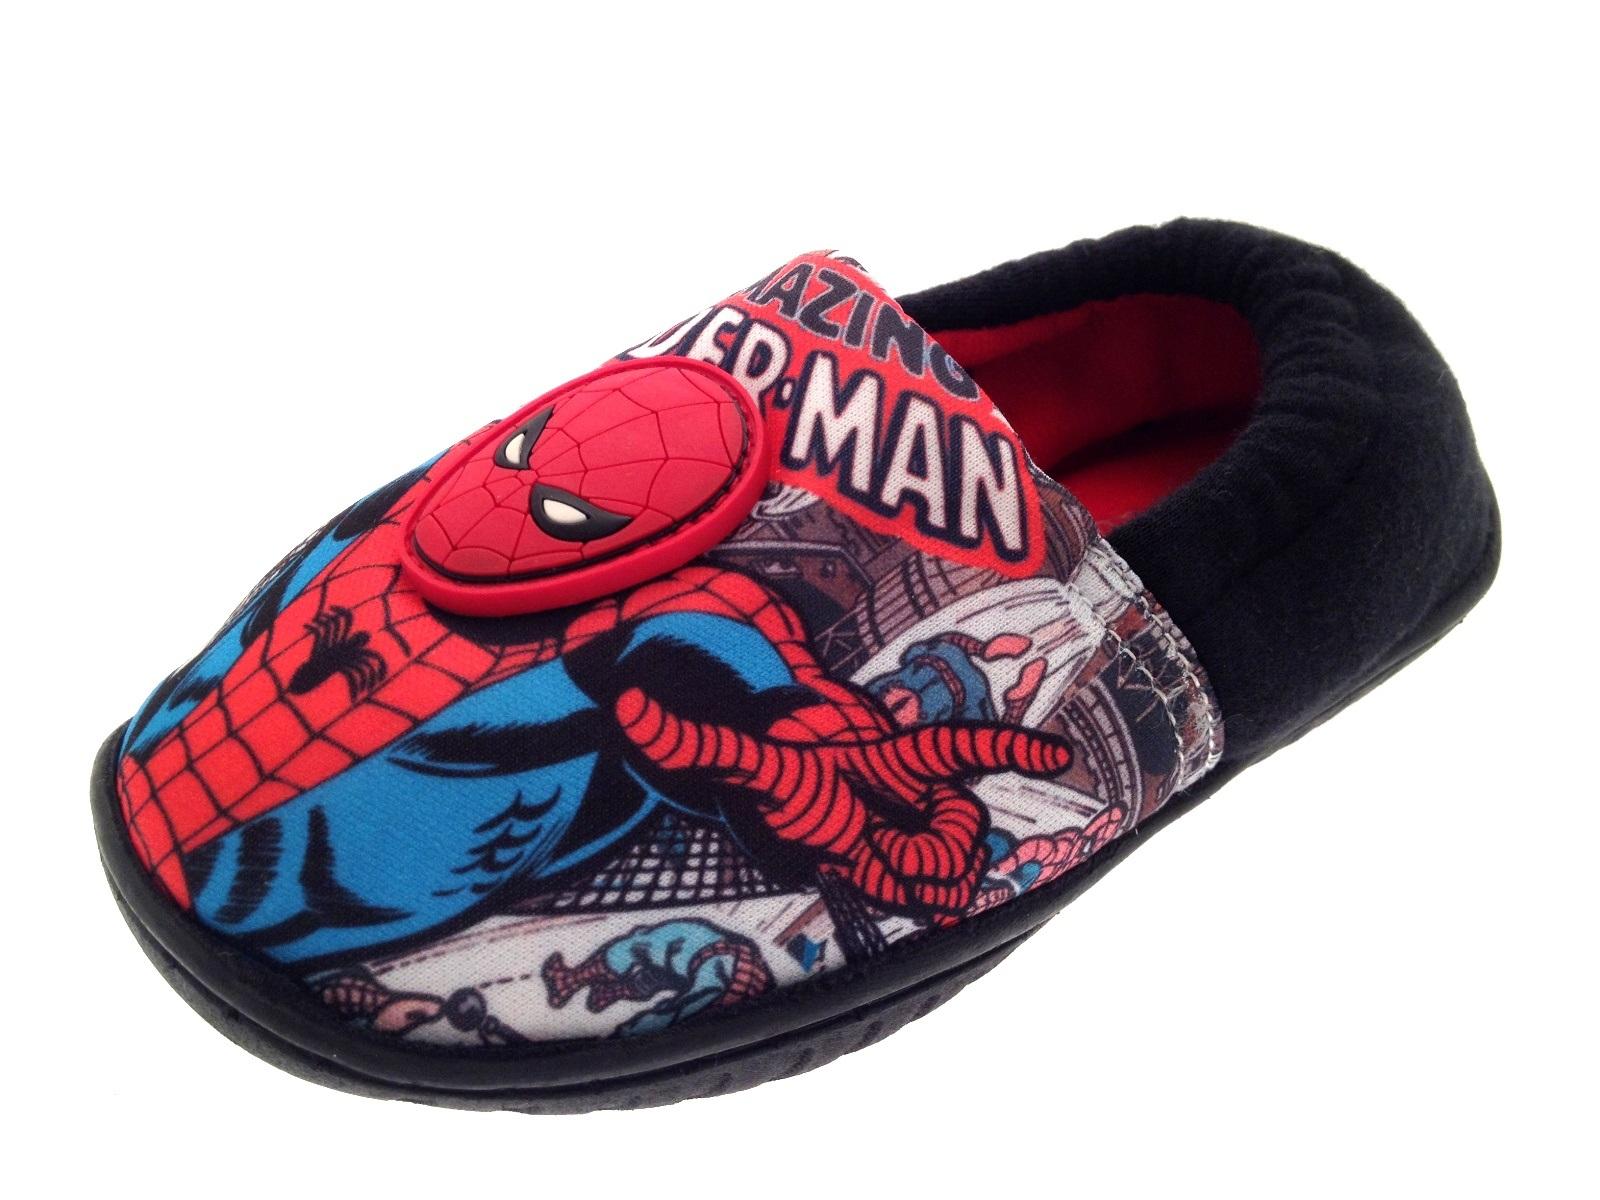 Marvel Ultimate Spiderman Slippers Kids Boys Childrens Velcro Shoes